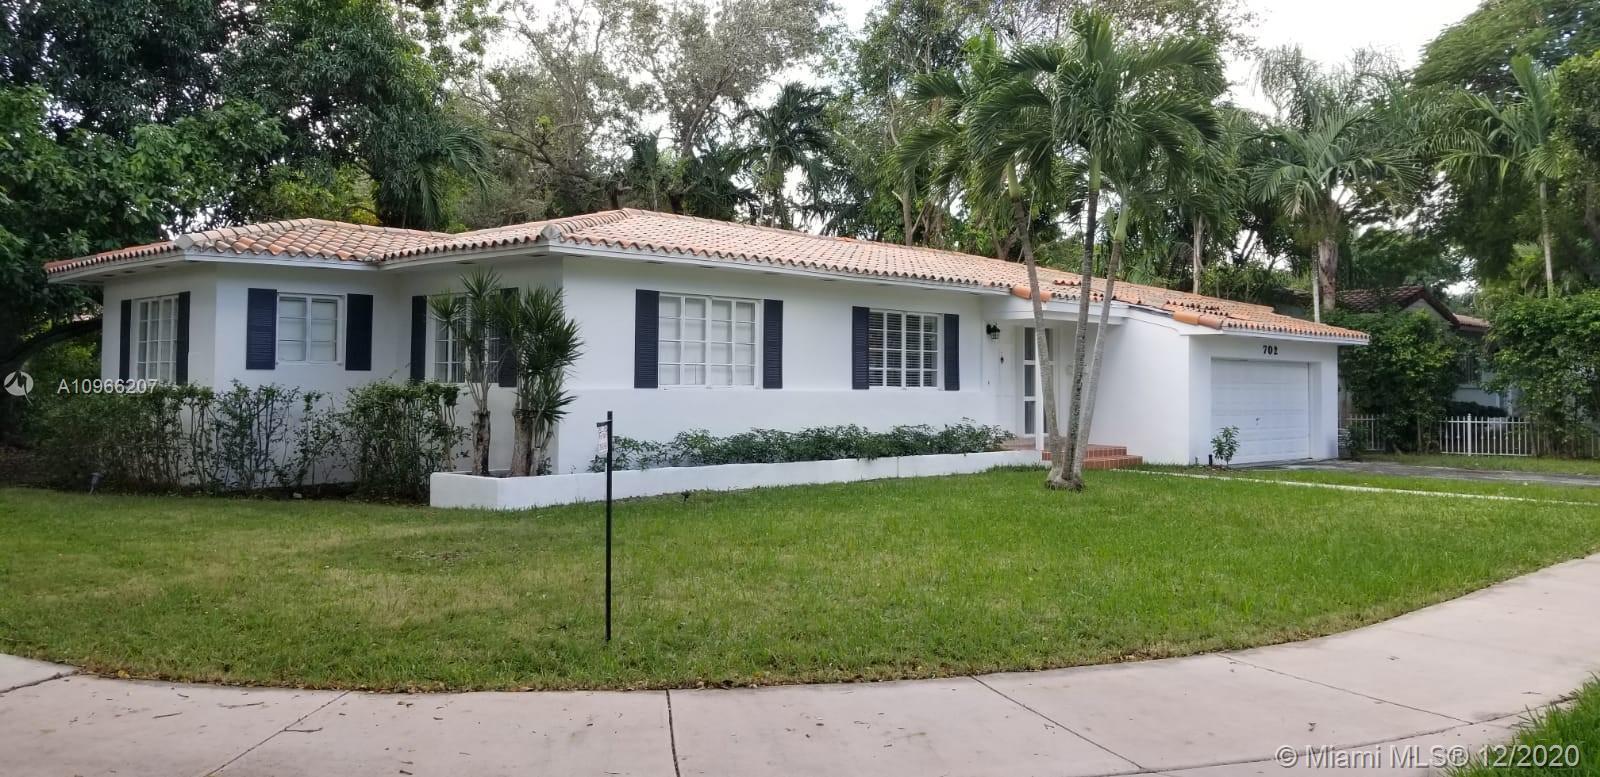 South Miami - 702 Tibidabo Ave, Coral Gables, FL 33143